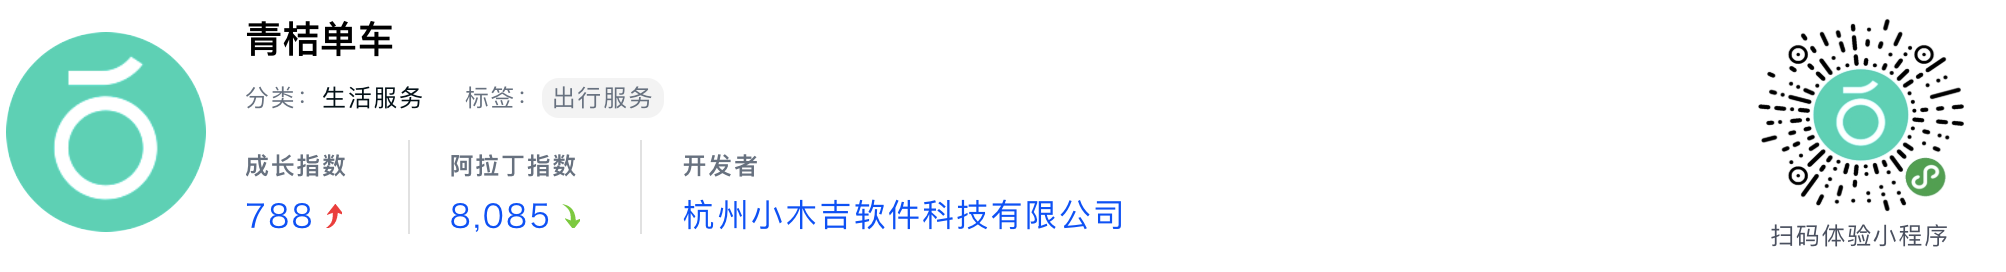 WeChatミニプログラム最新ランキングTOP20【2019年6月版】20位 :青桔单车